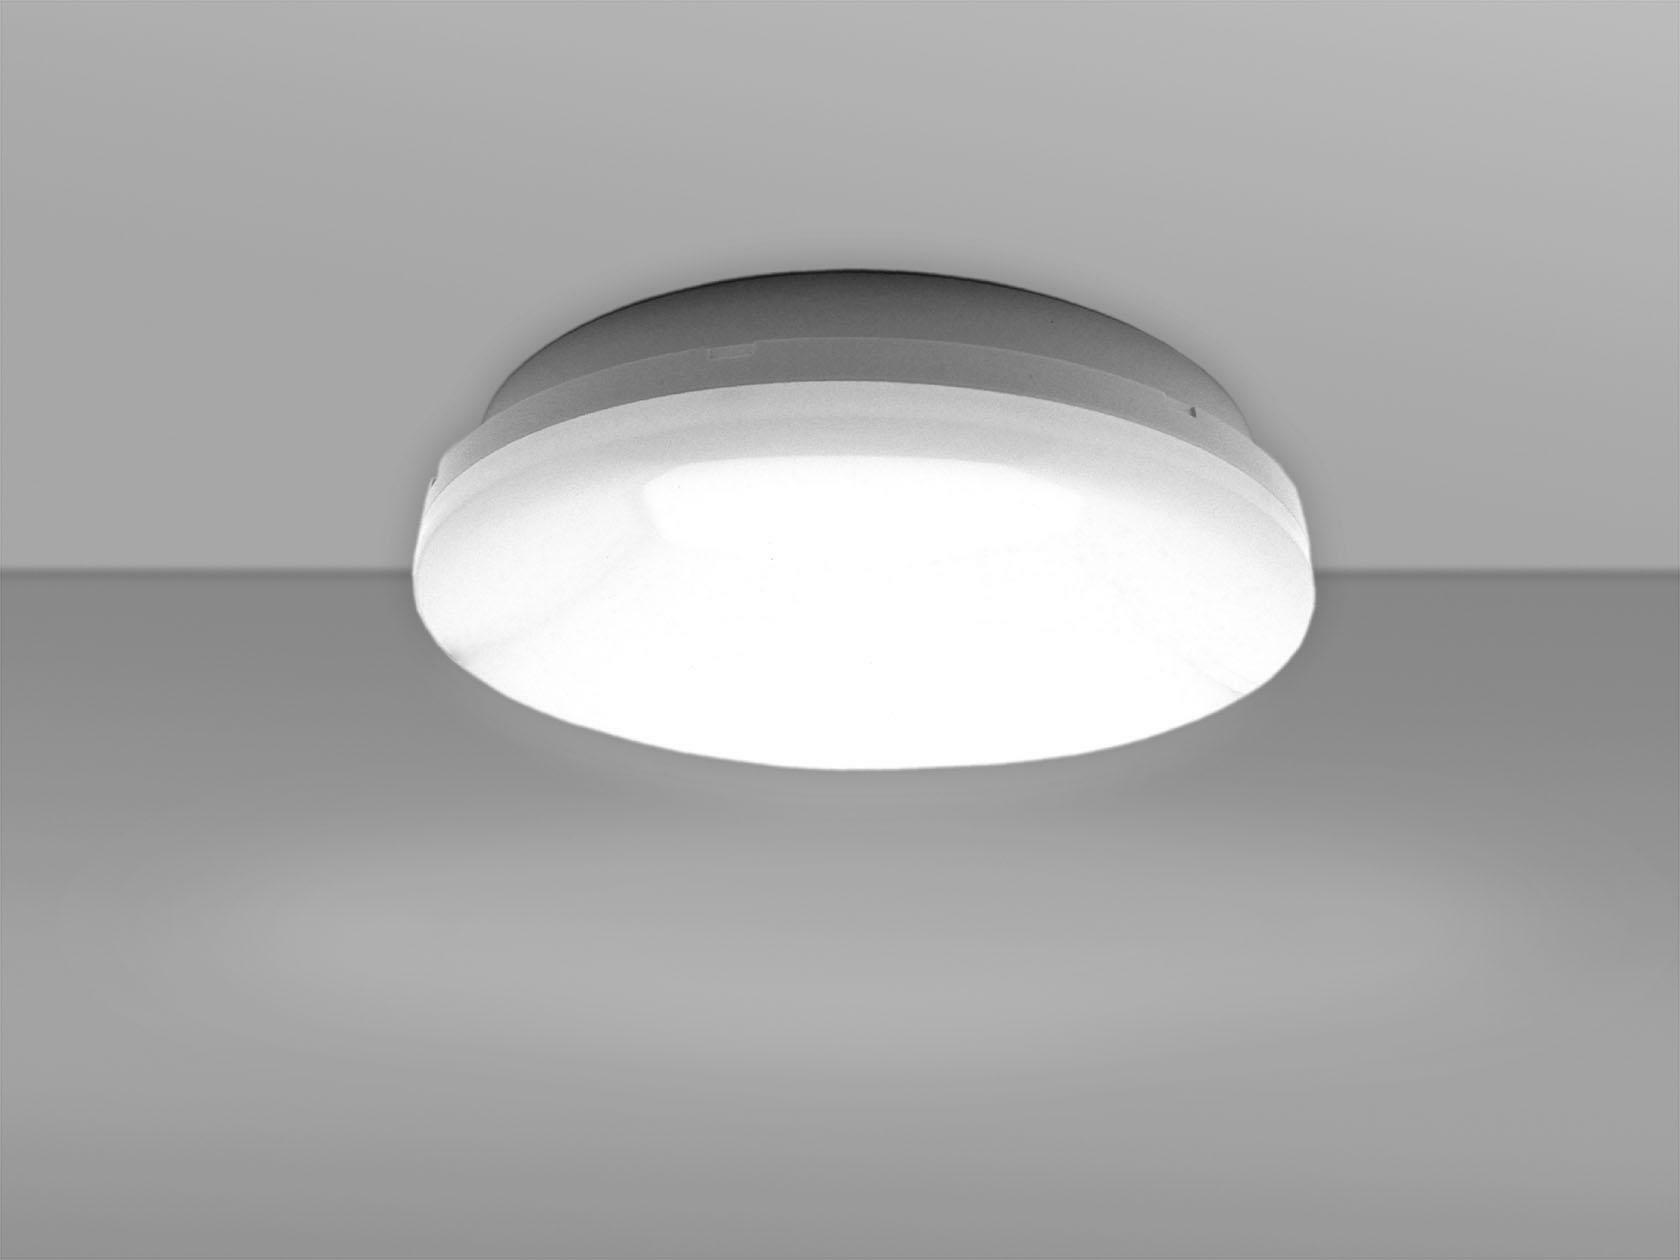 Plafoniera Led 4000k : Nobile illuminazione plafoniera led tonda w k lm ip